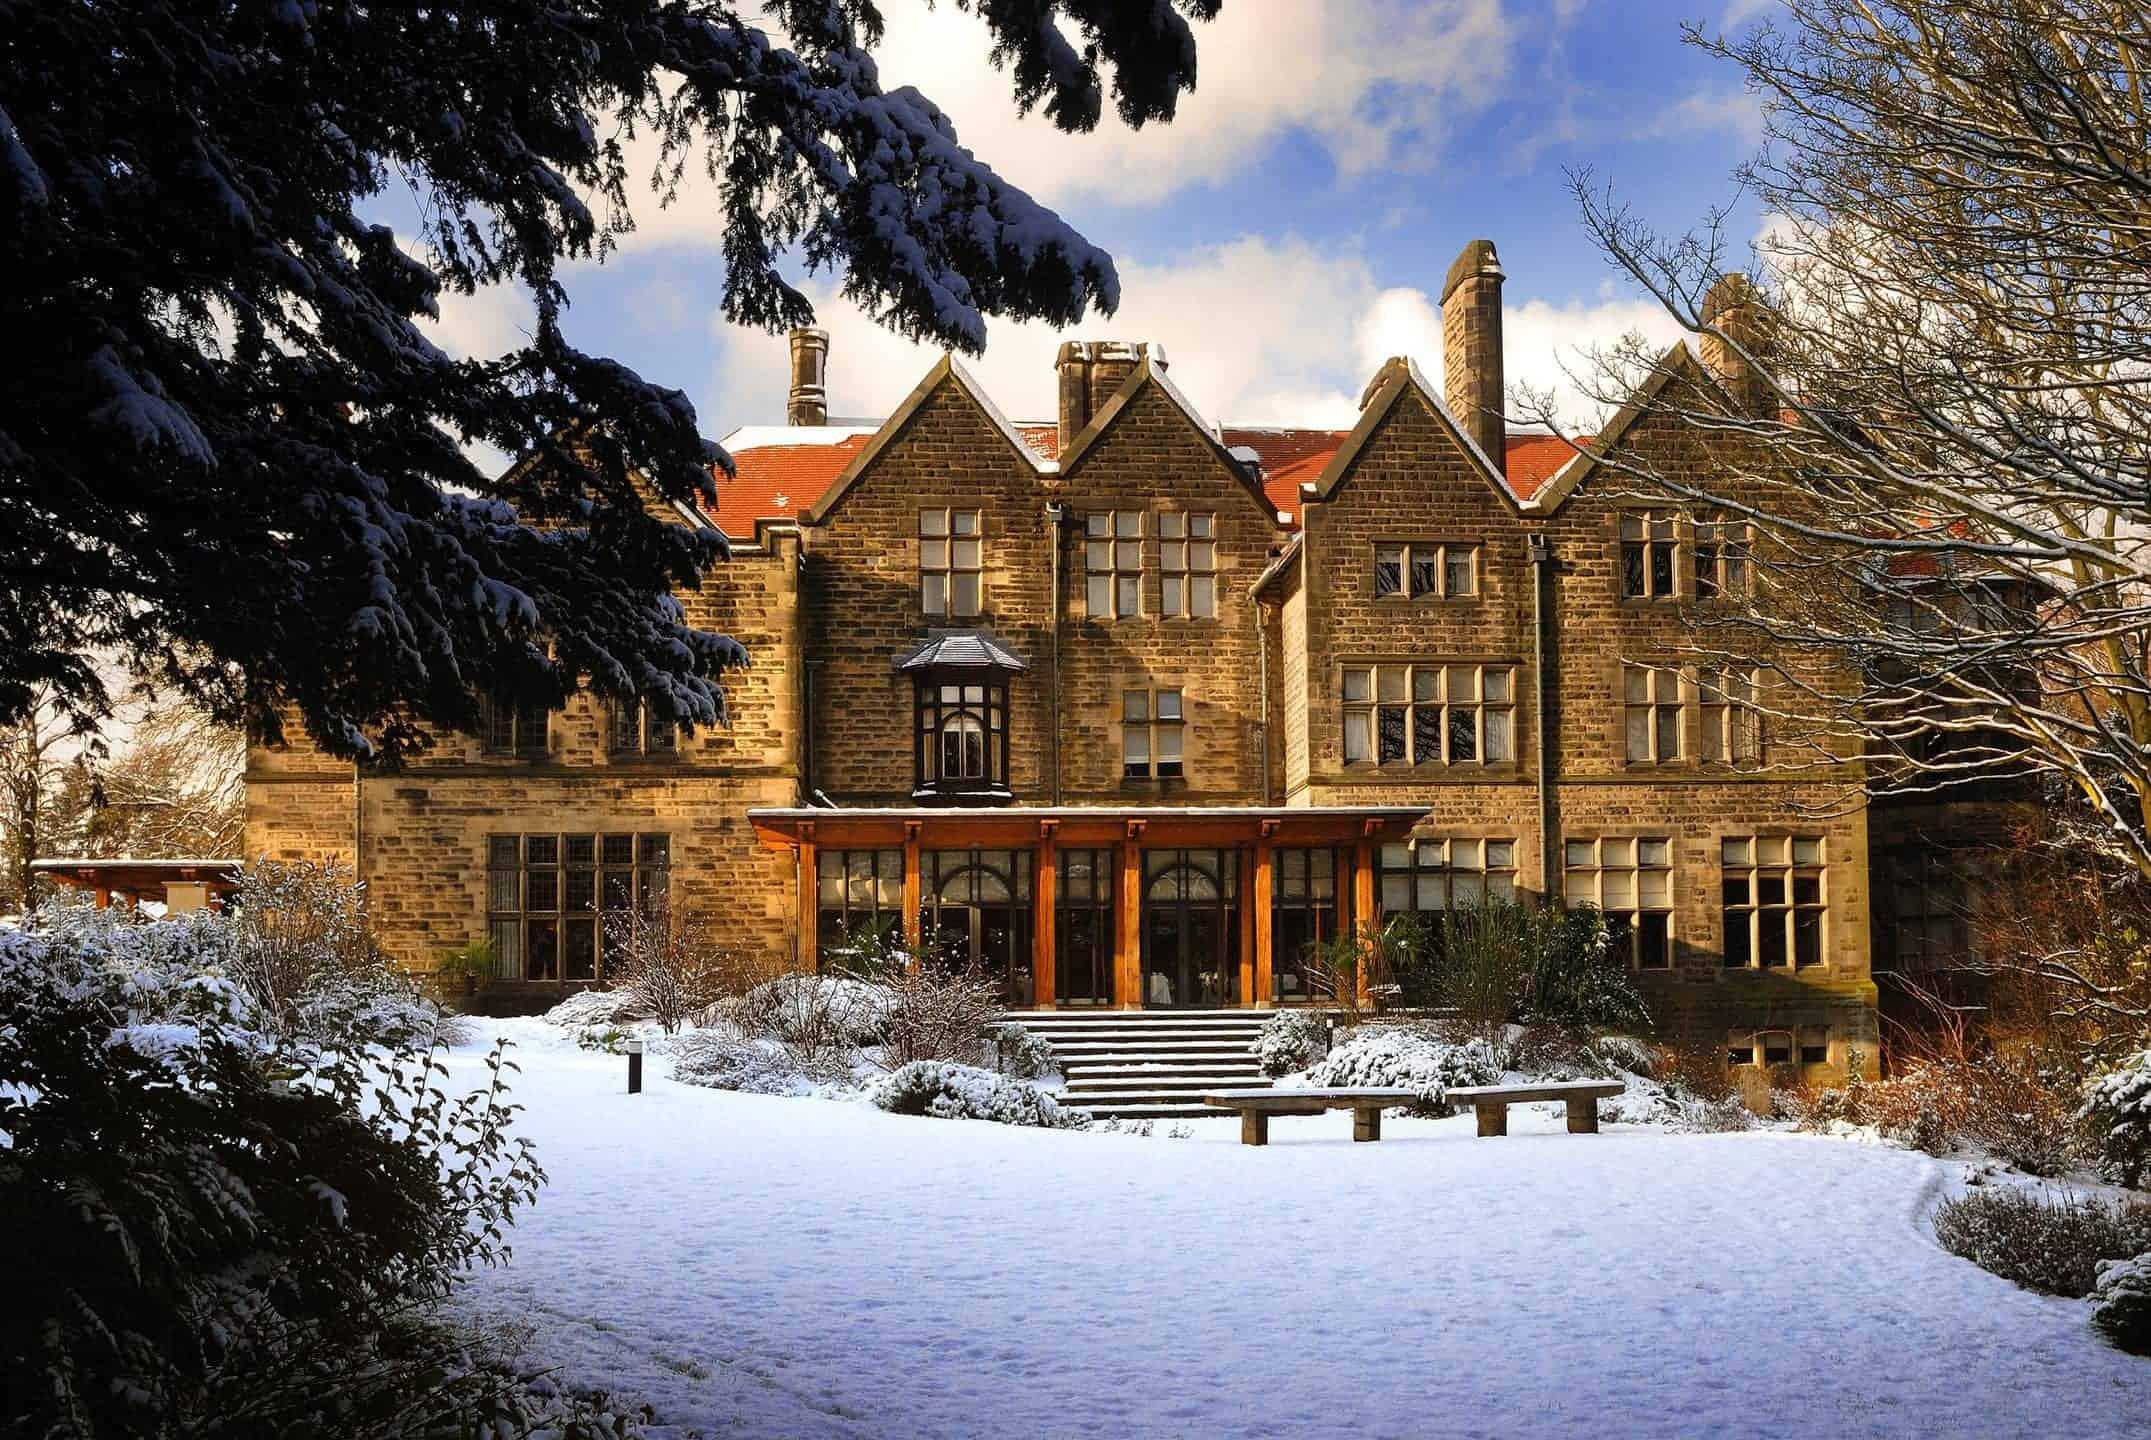 hotel-in-snow